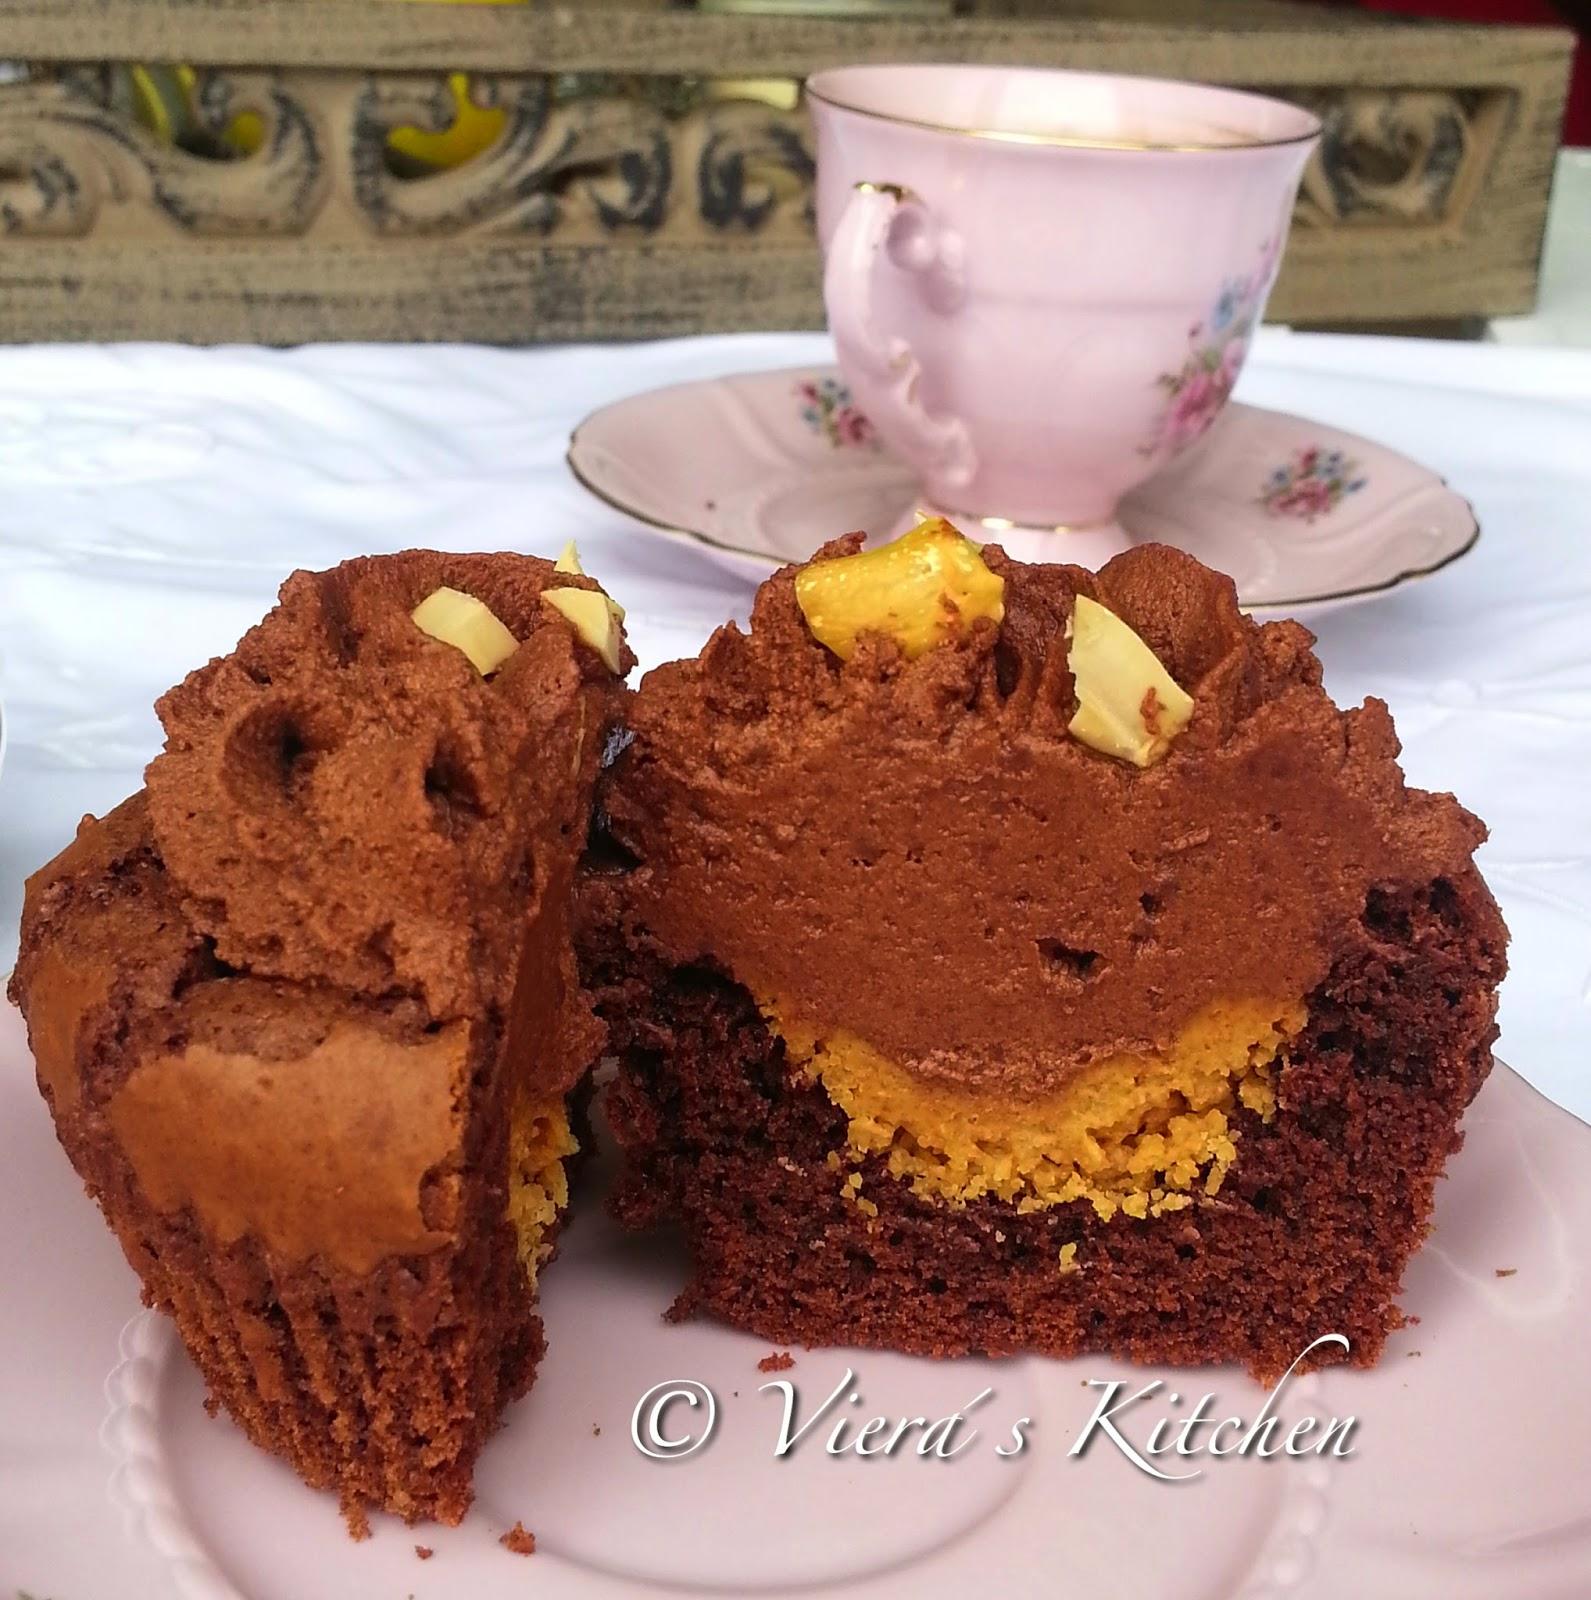 http://vieras-kitchen.blogspot.de/2014/11/erdnuss-schoko-cupcakes-fur.html